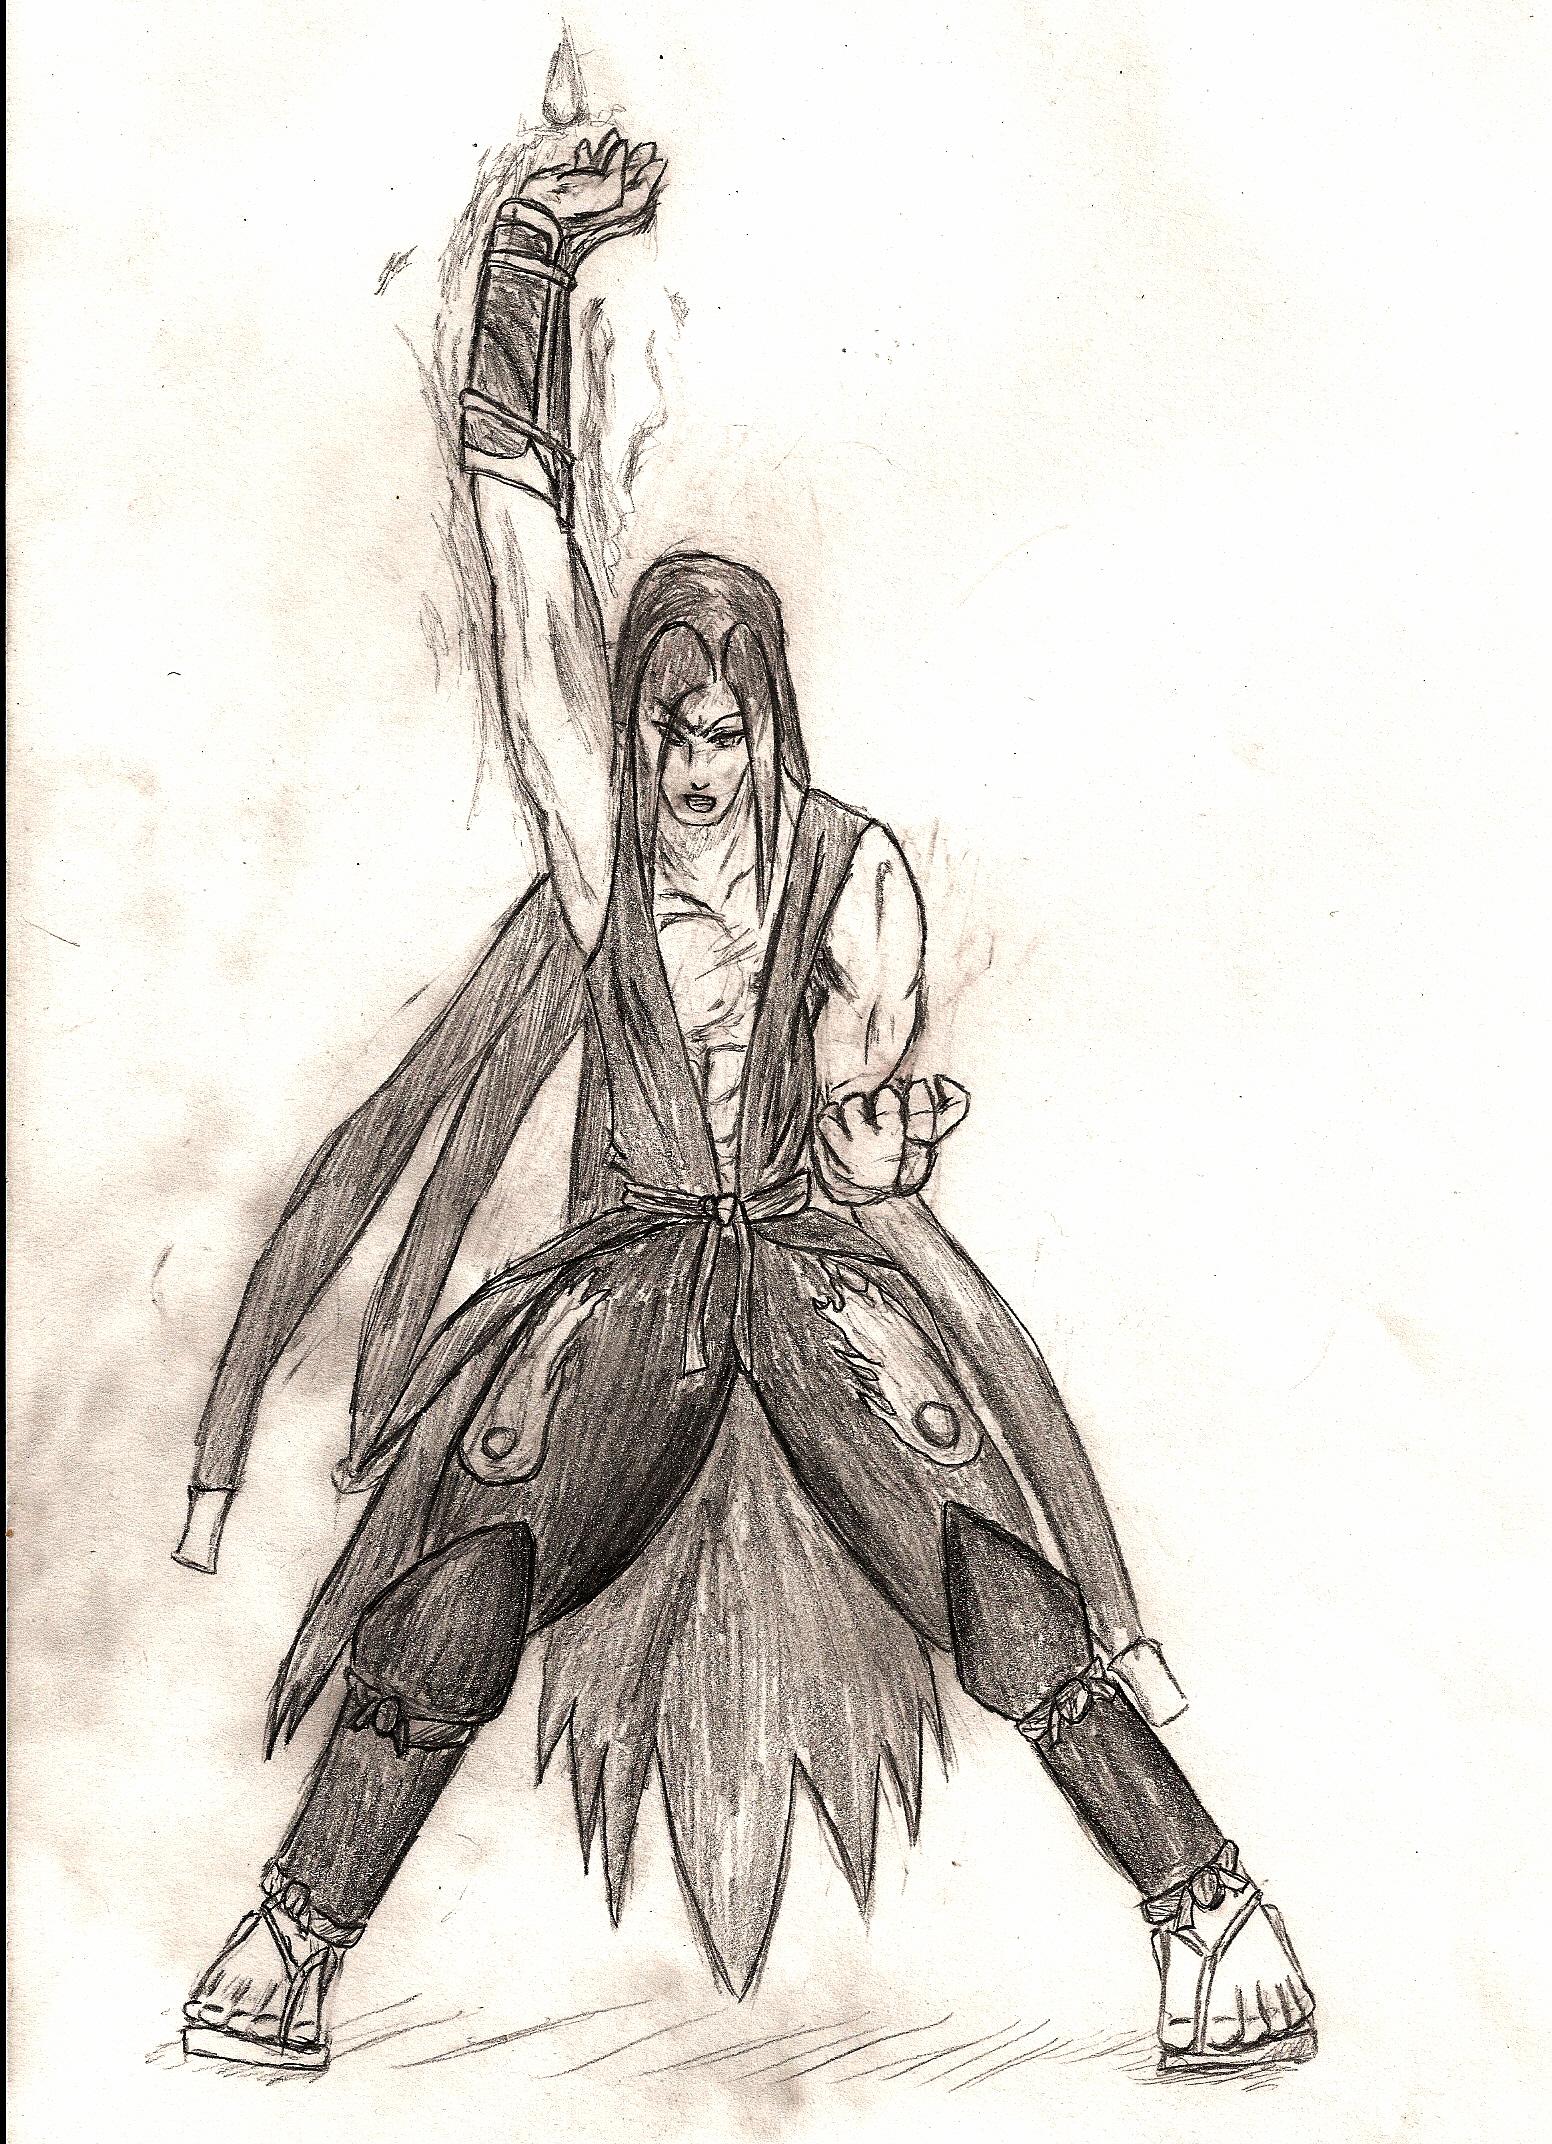 Kagekiyo standard battle suit